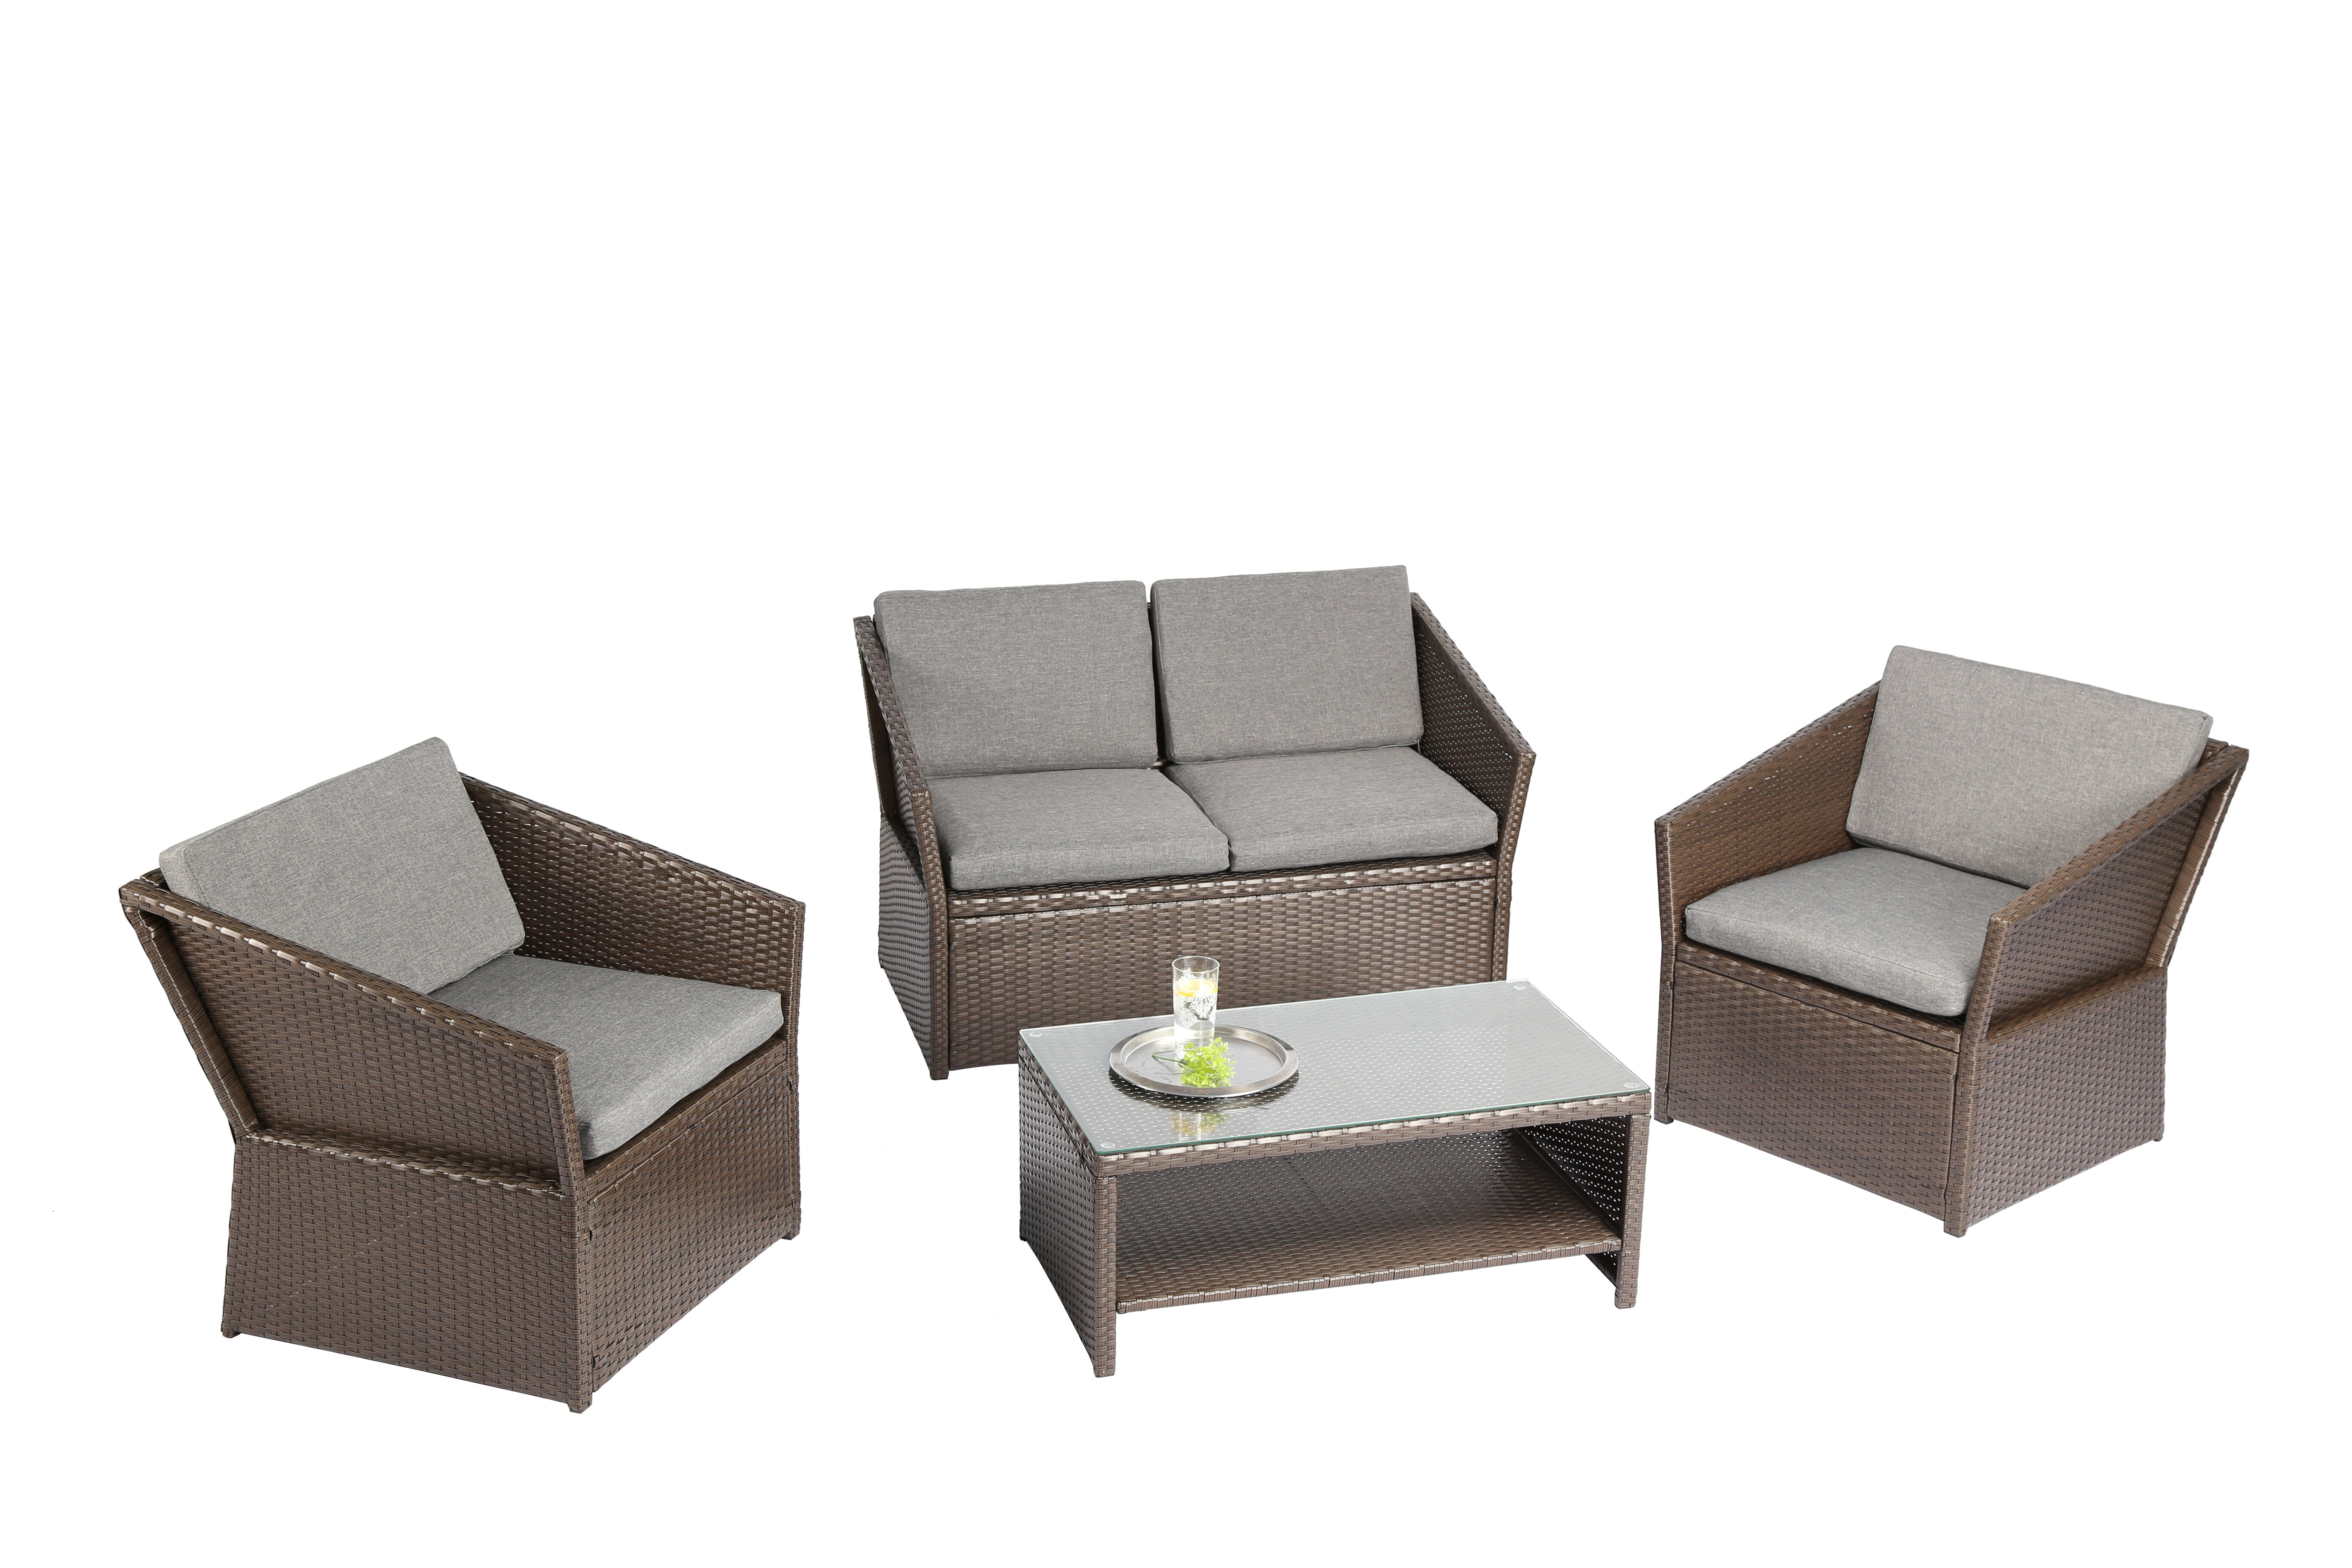 40571feeb79e Baner Garden 4 Piece Dining Set with Cushions & Reviews   Wayfair